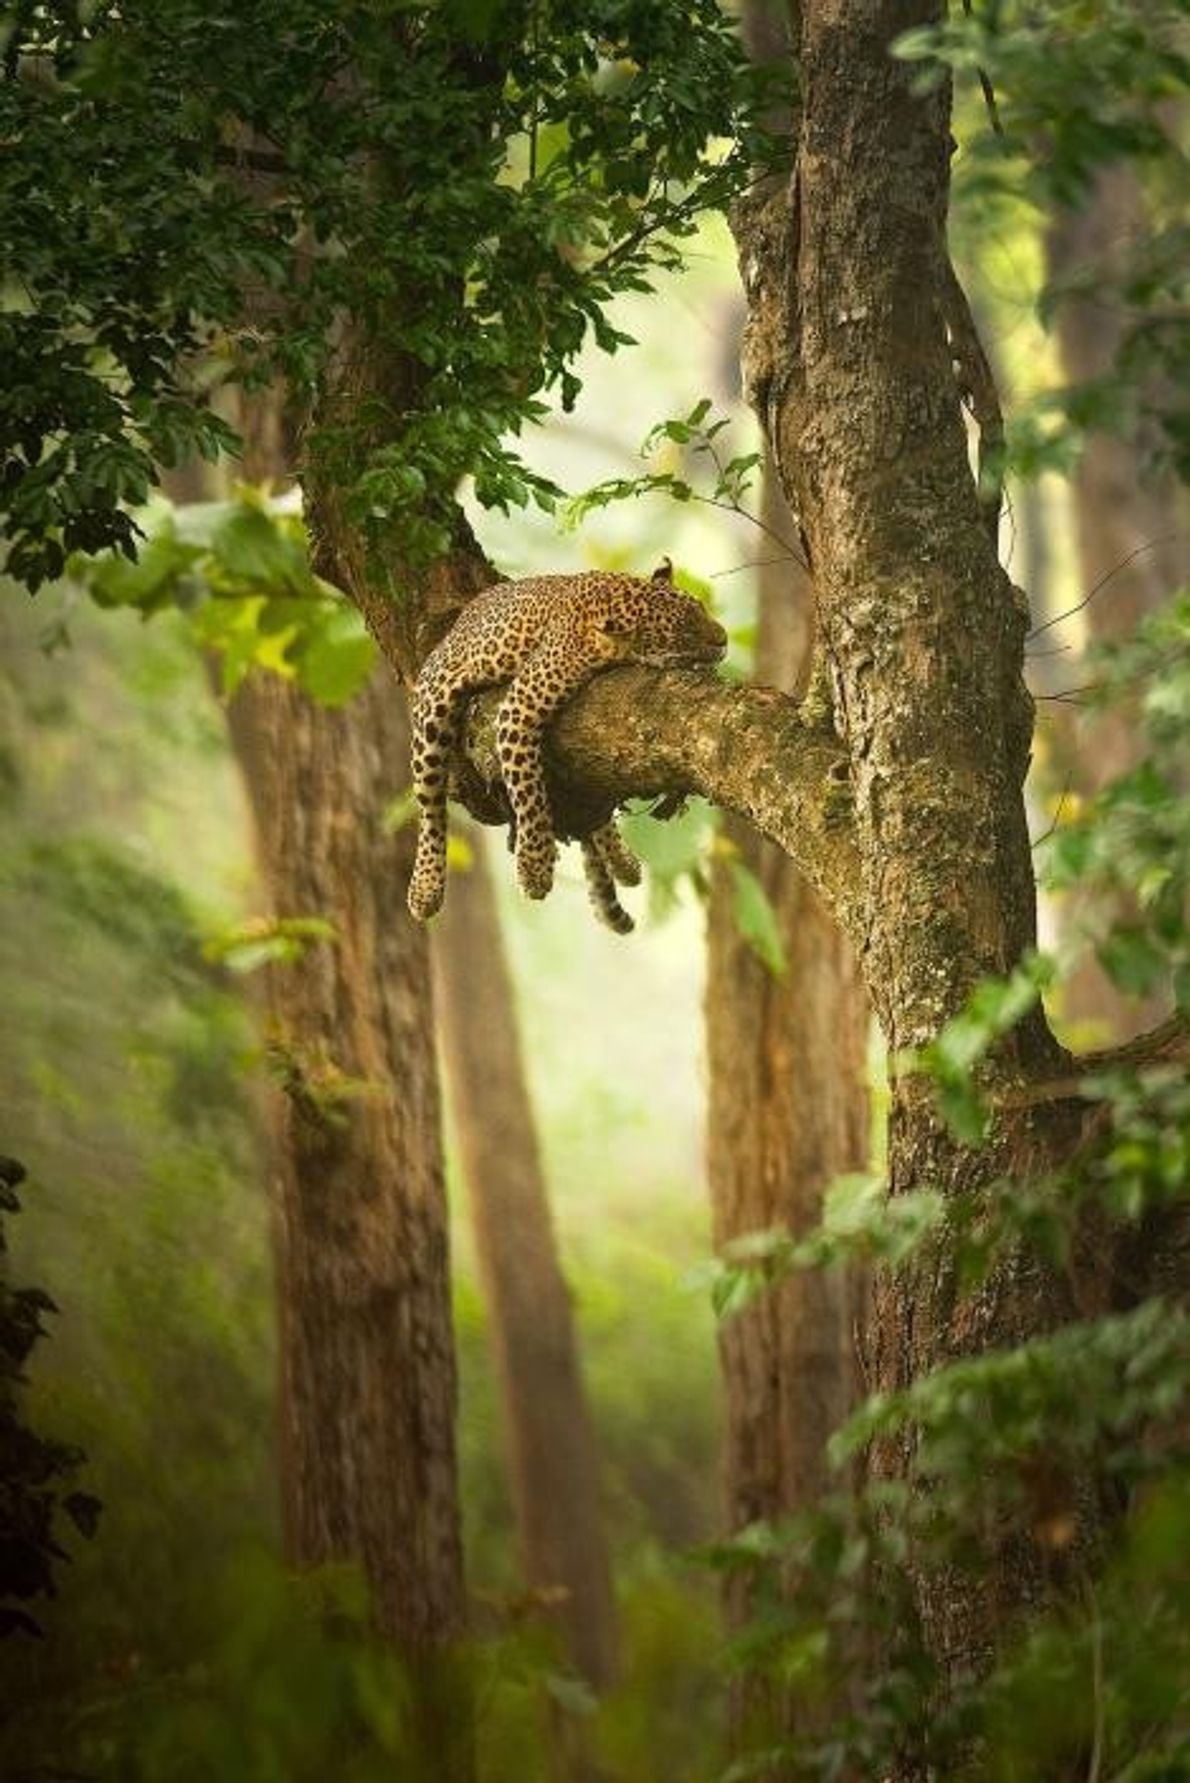 Un léopard endormi s'accroche à sa branche.